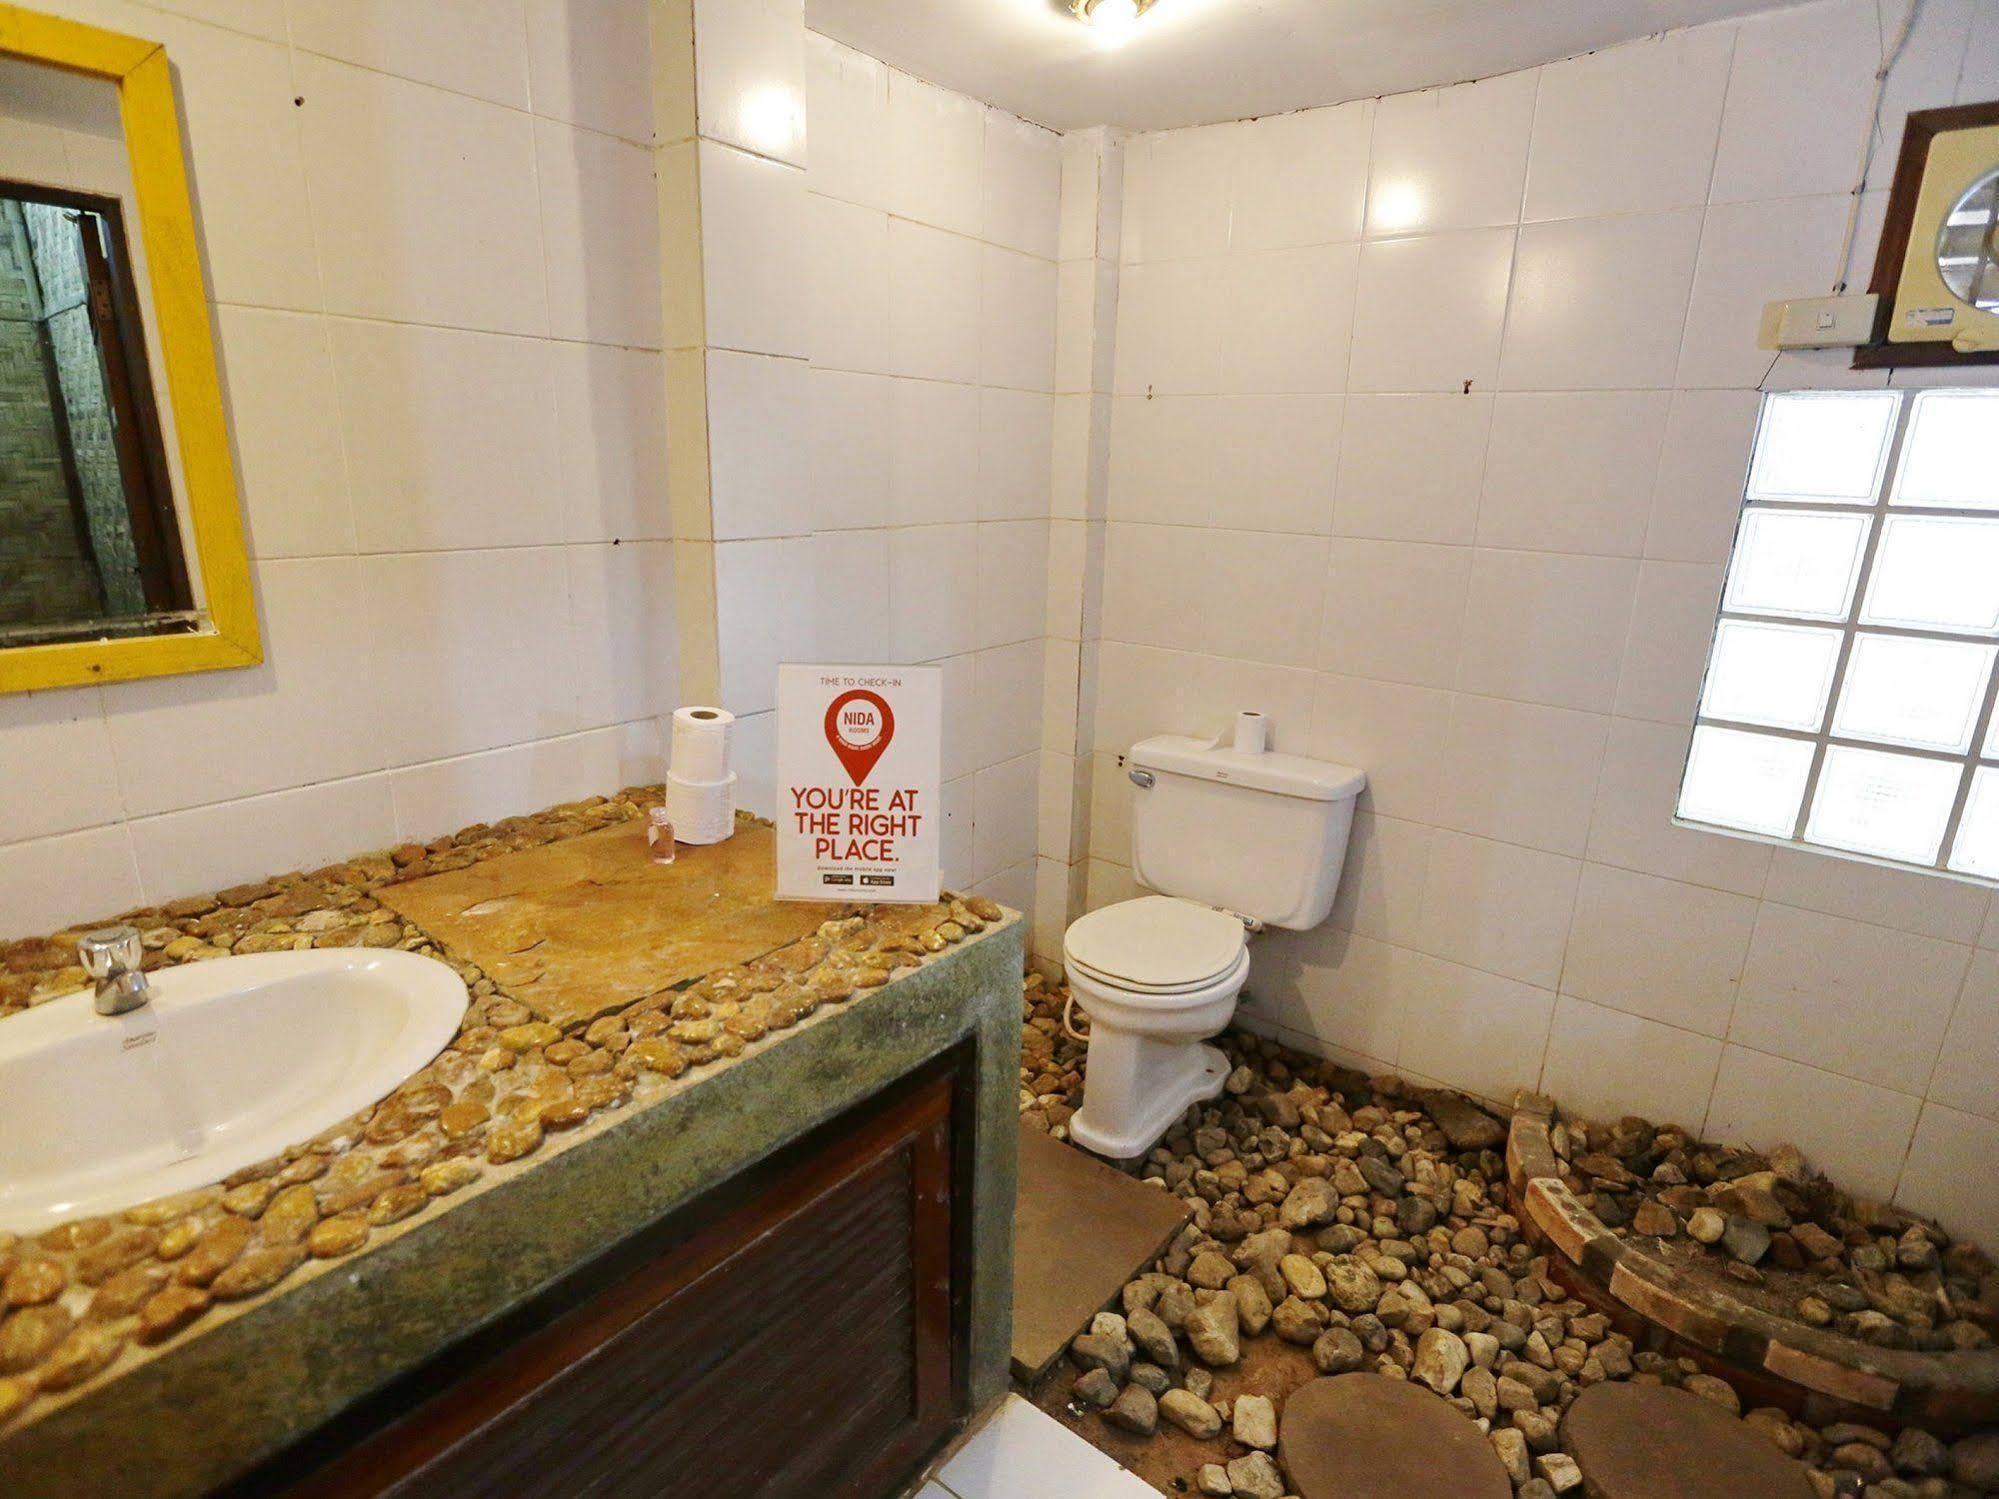 Nida Rooms Mae Ai Mineral Hat Springs Buri, Mae Ai